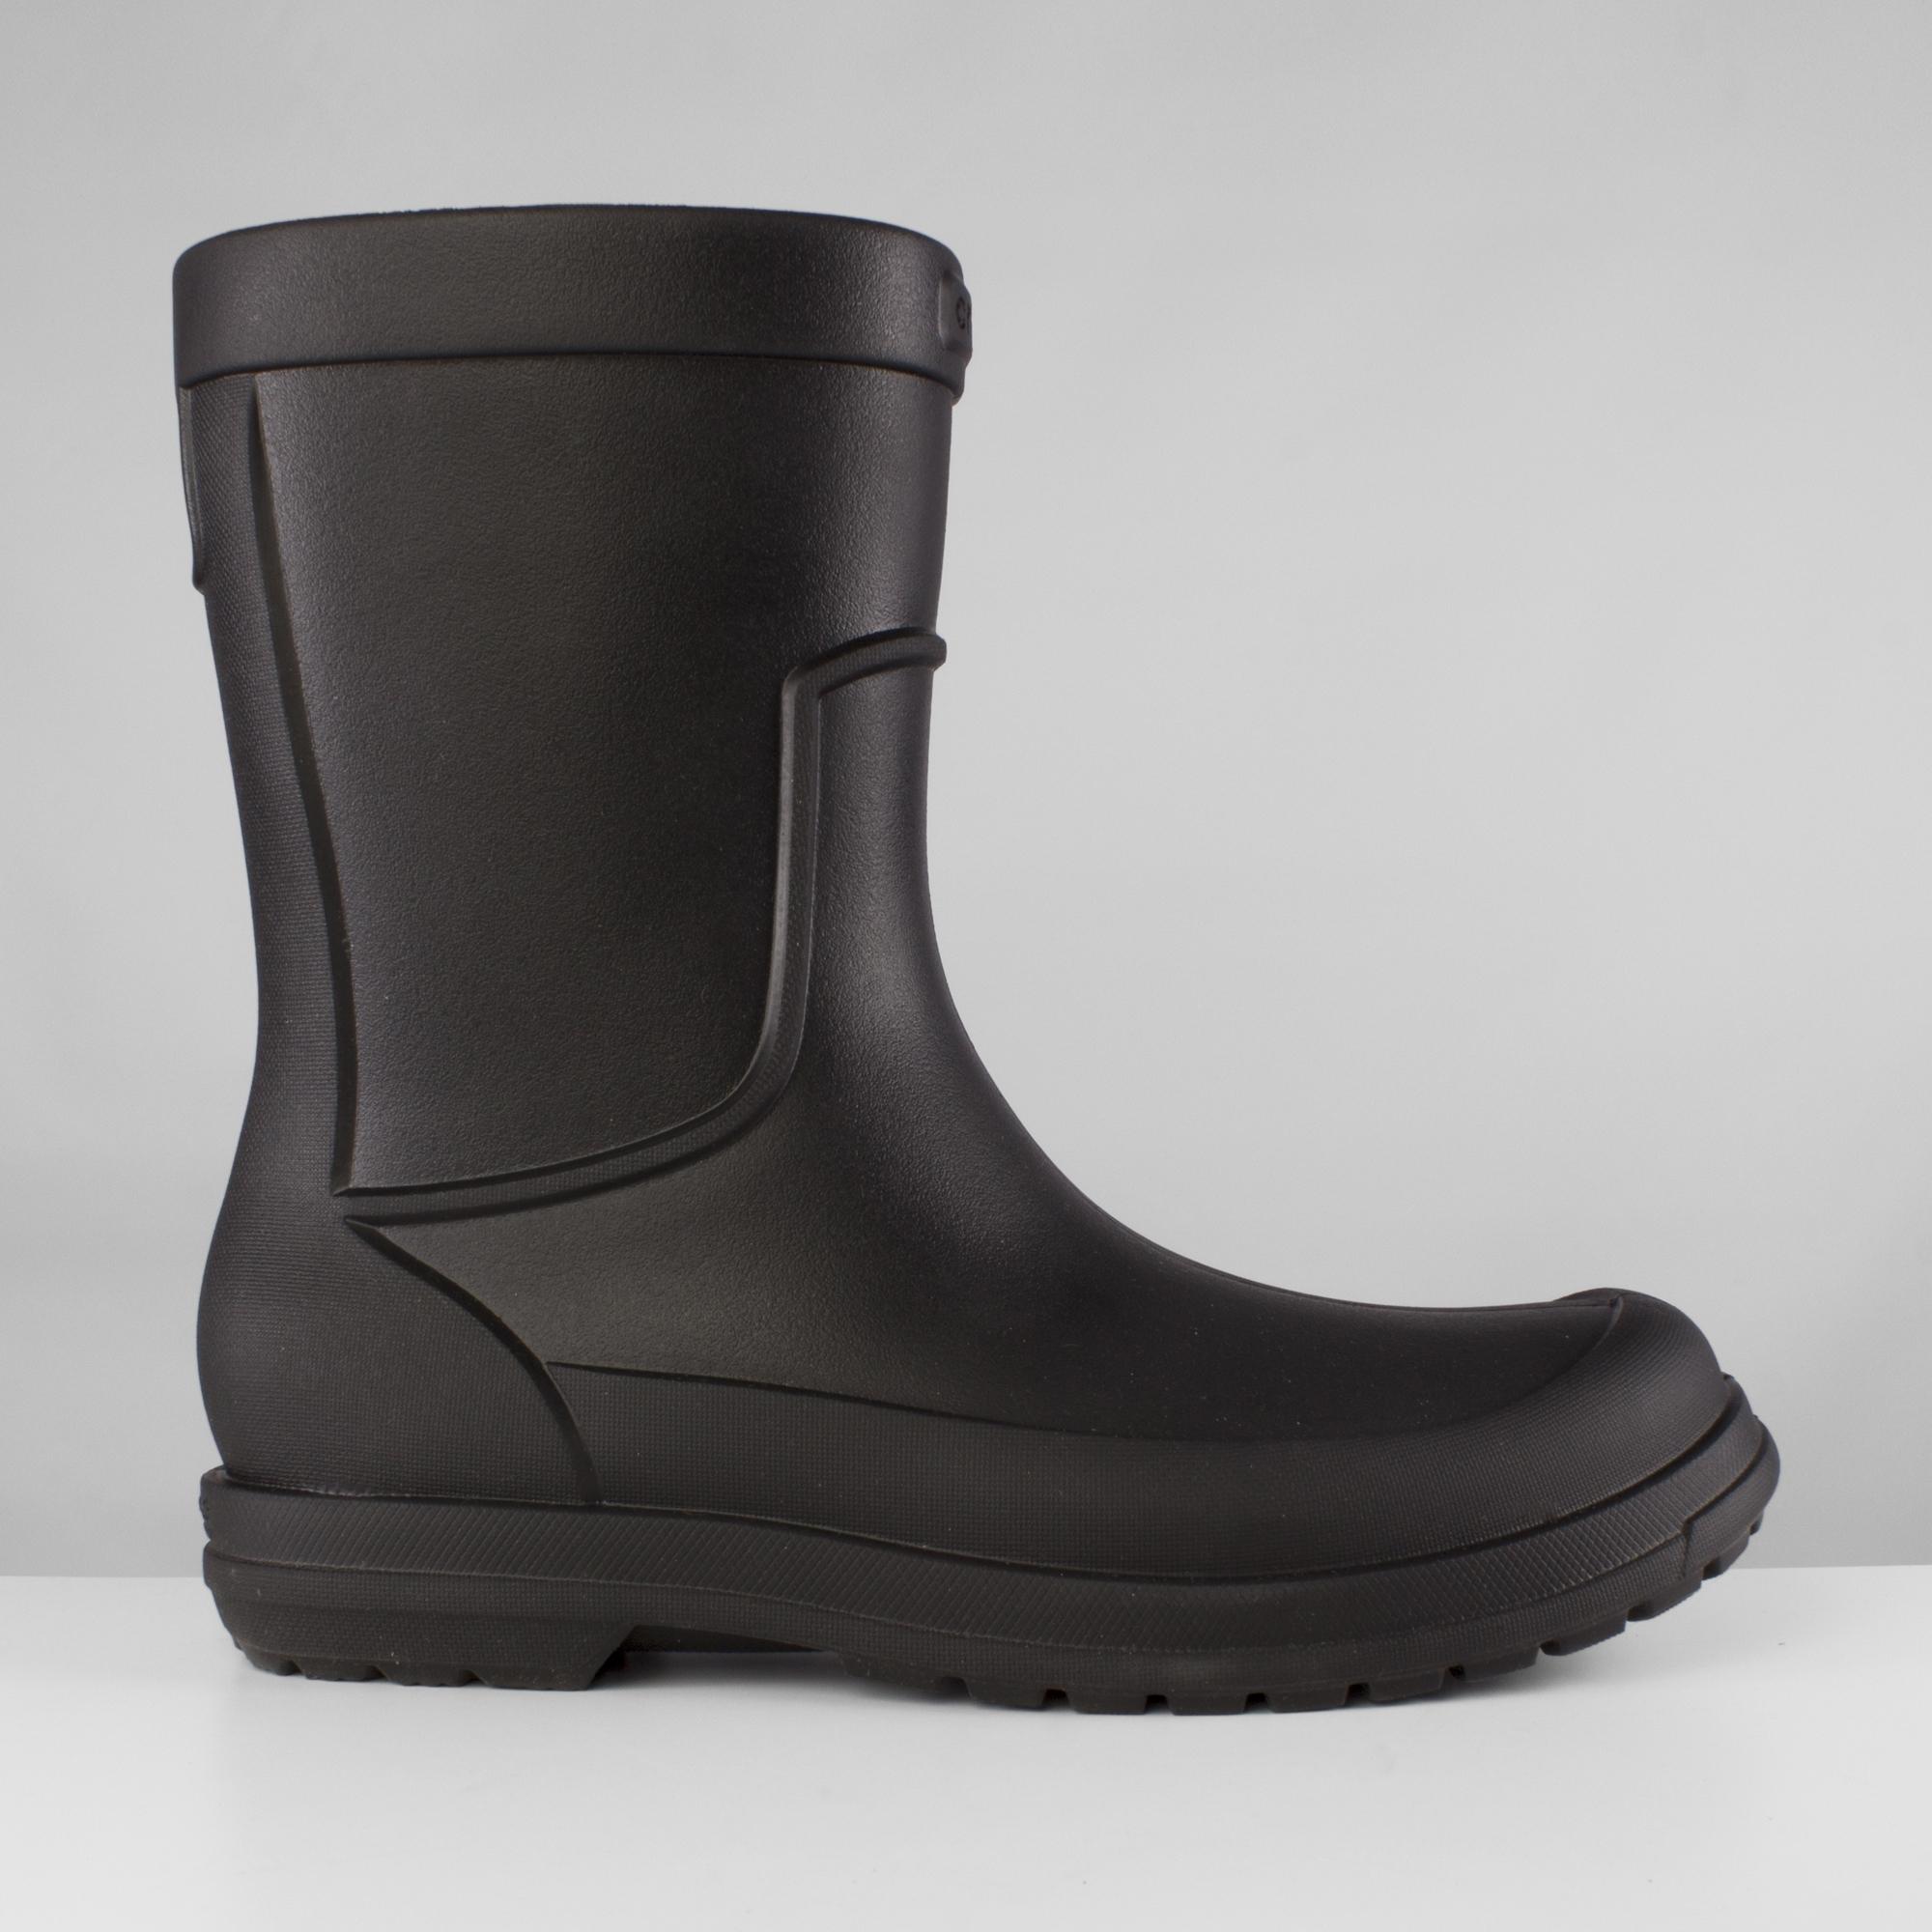 Crocs 204862 ALLCAST RAIN BOOT